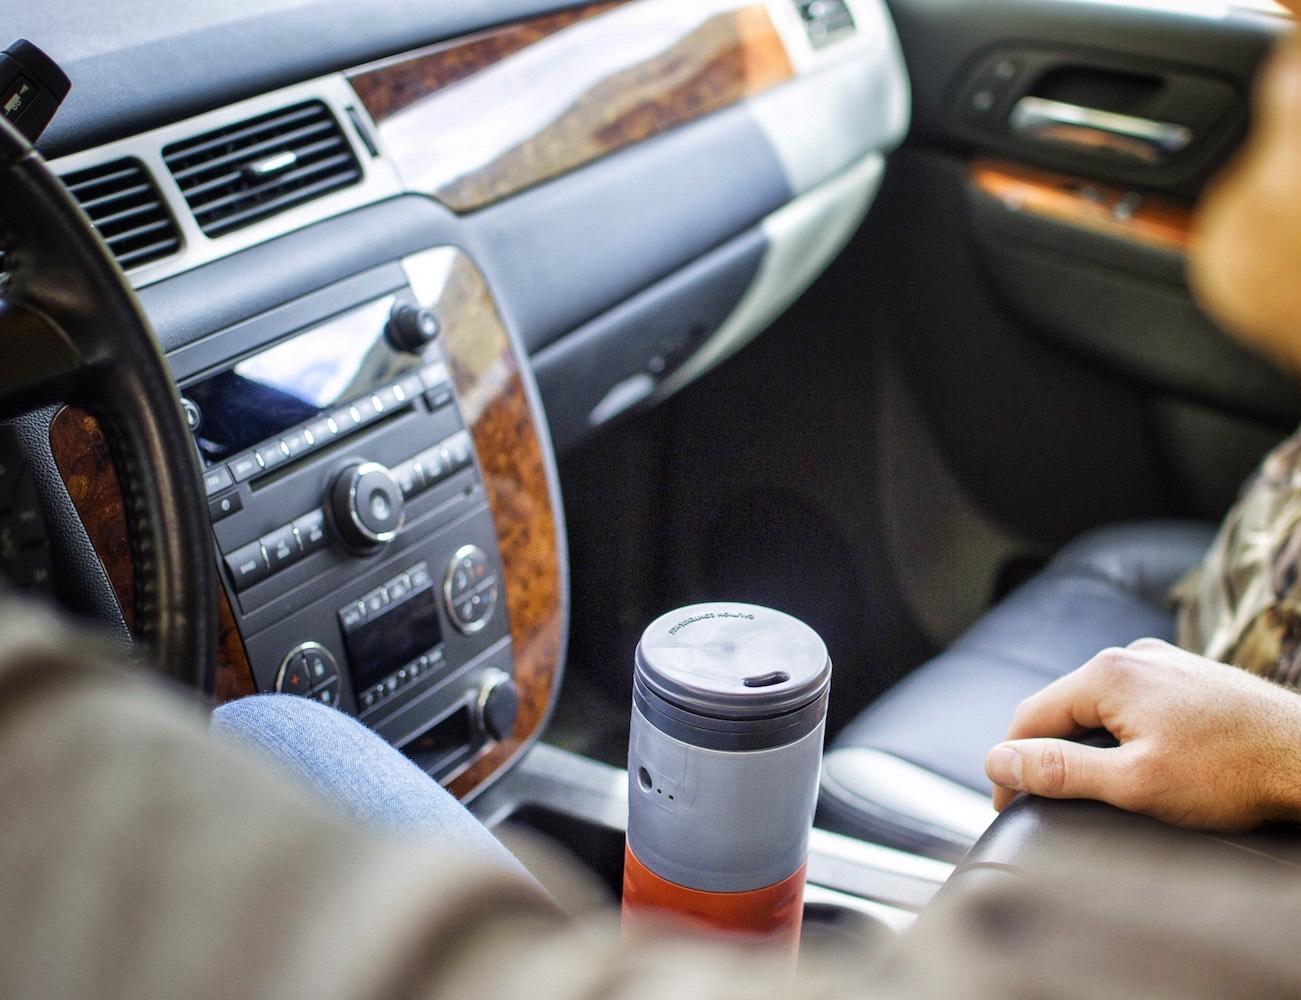 mojoe™ – Coffee Maker + Travel Mug